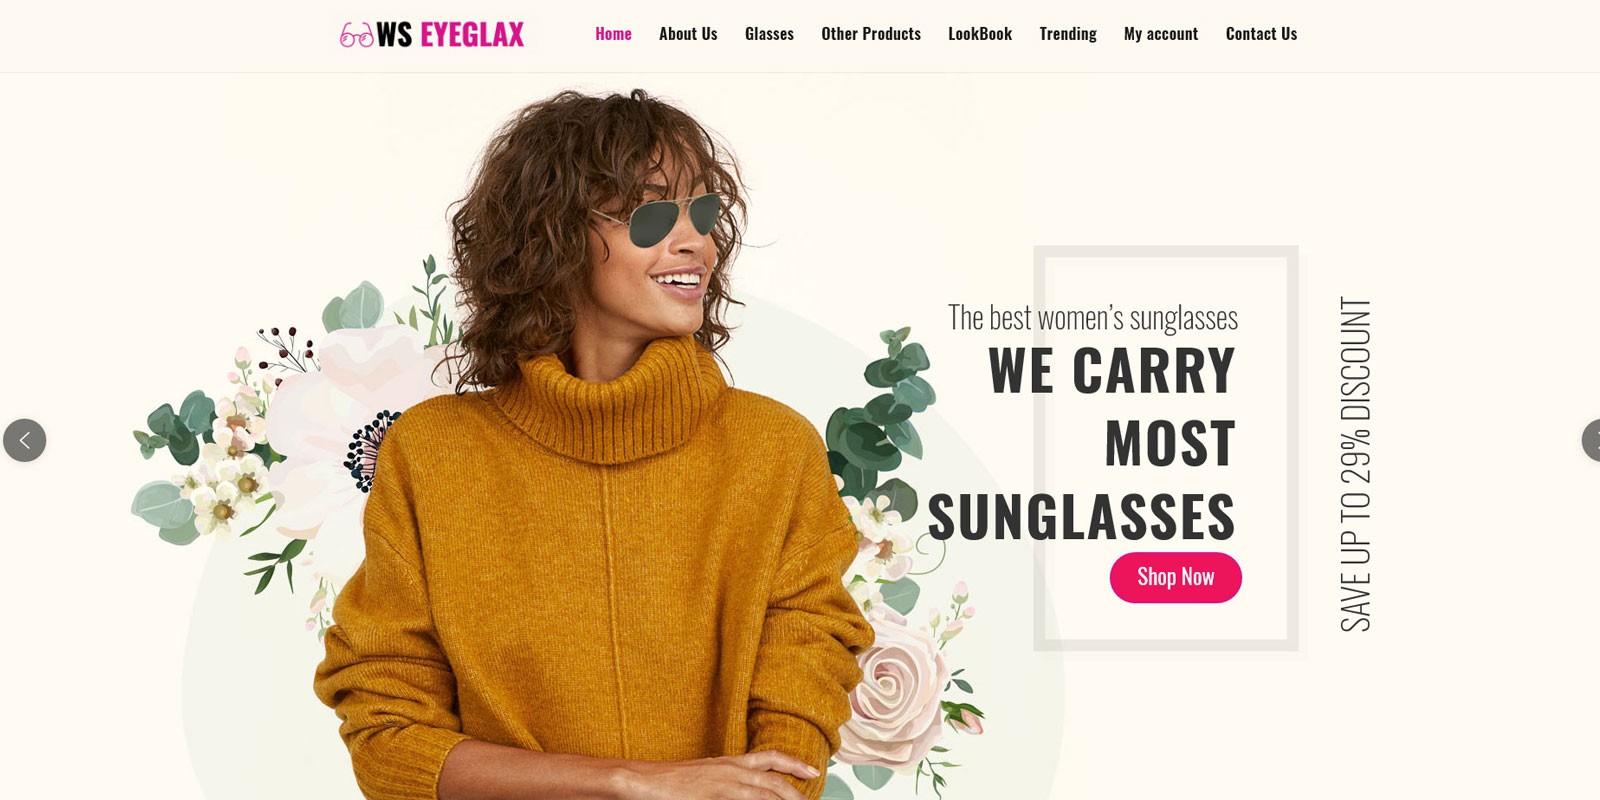 EyeGlax - WordPress Theme